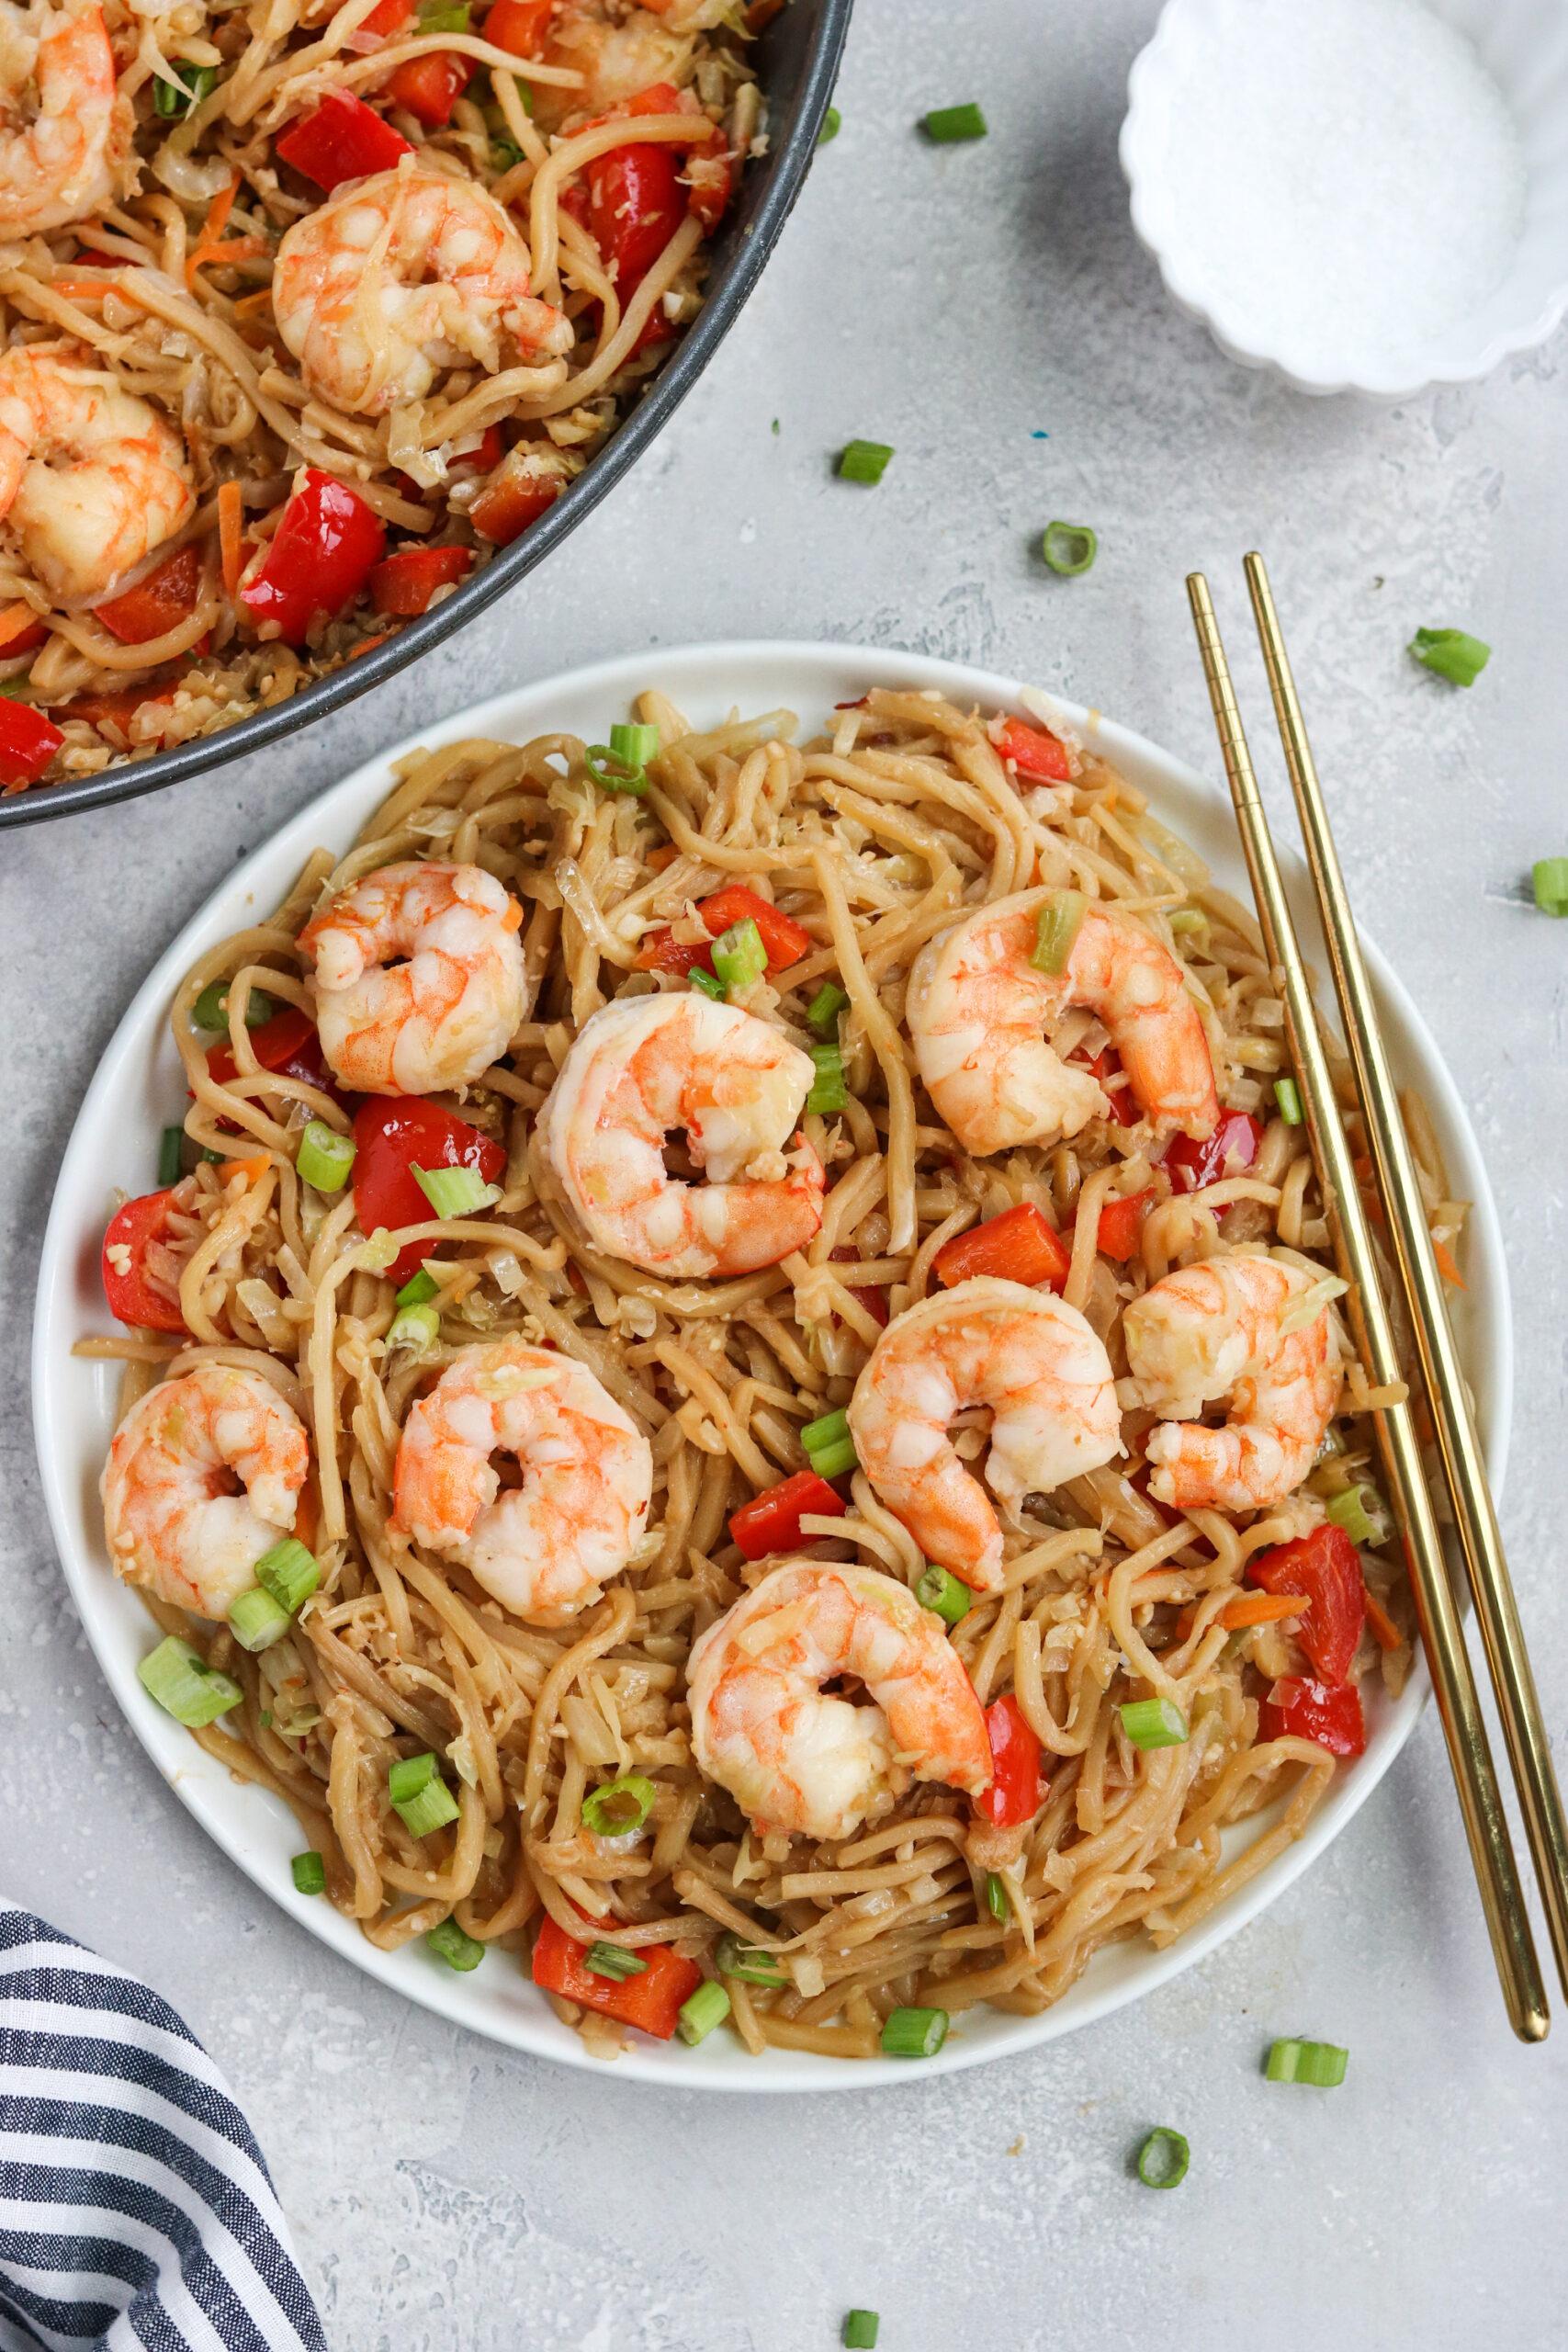 Shrimp lo mein gluten free